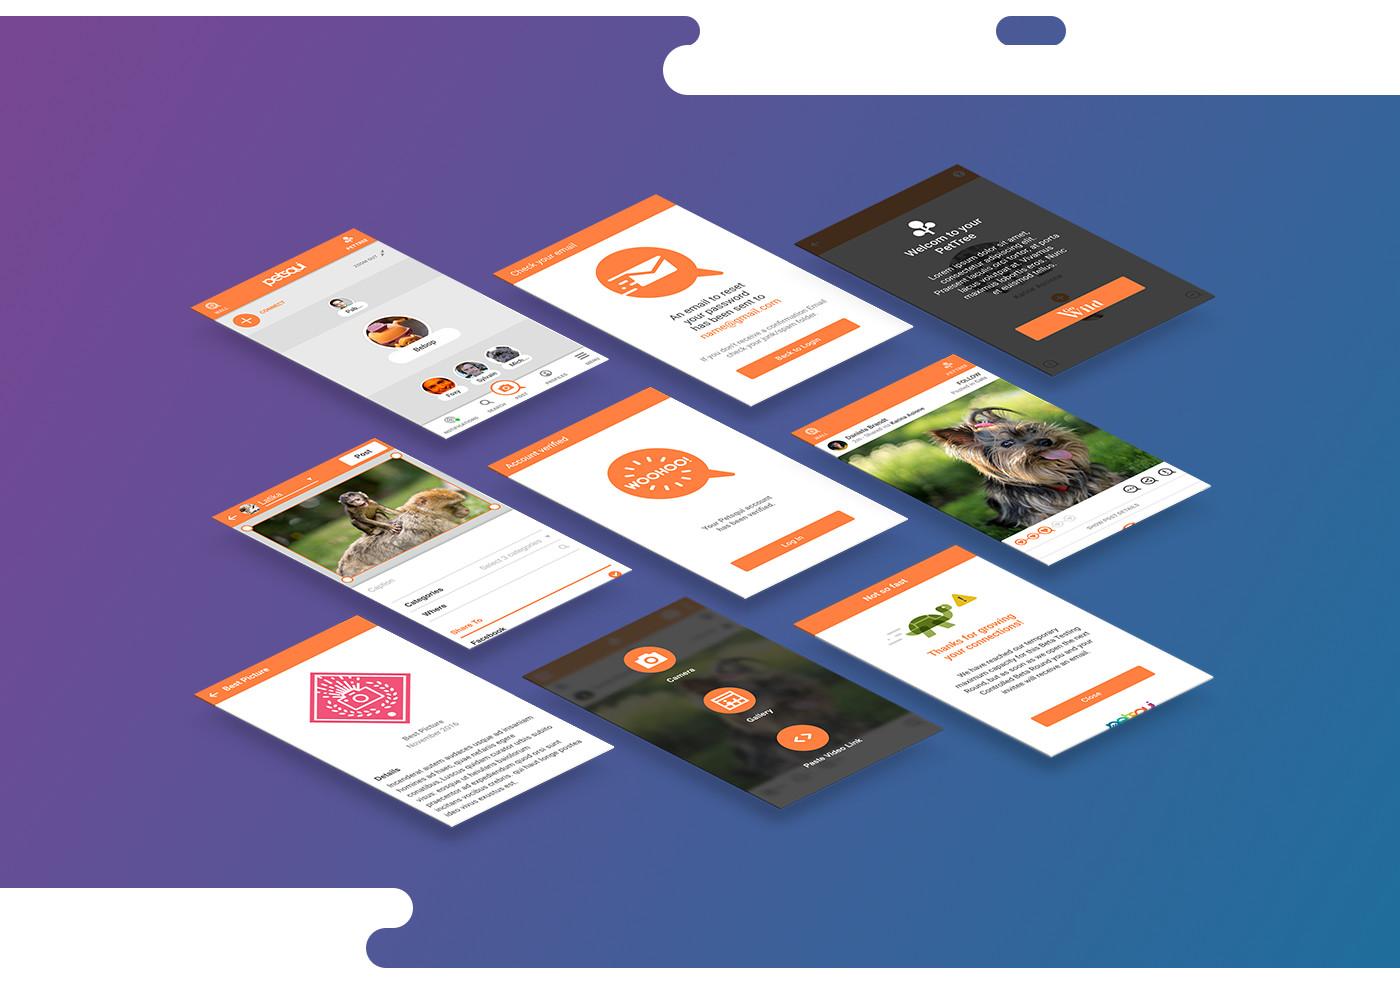 Application design for Montreal startup